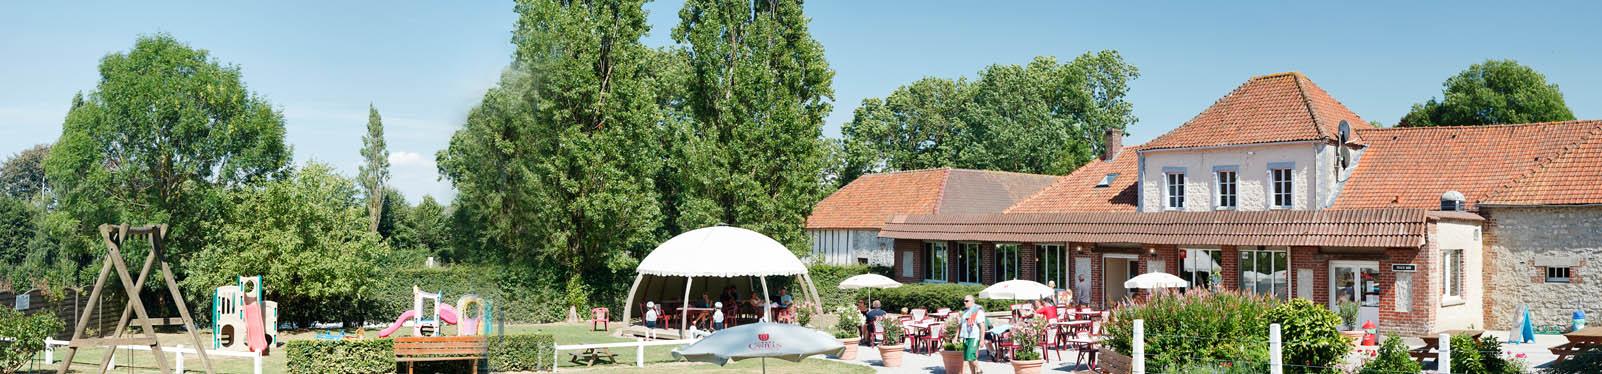 Camping La Bien-Assise